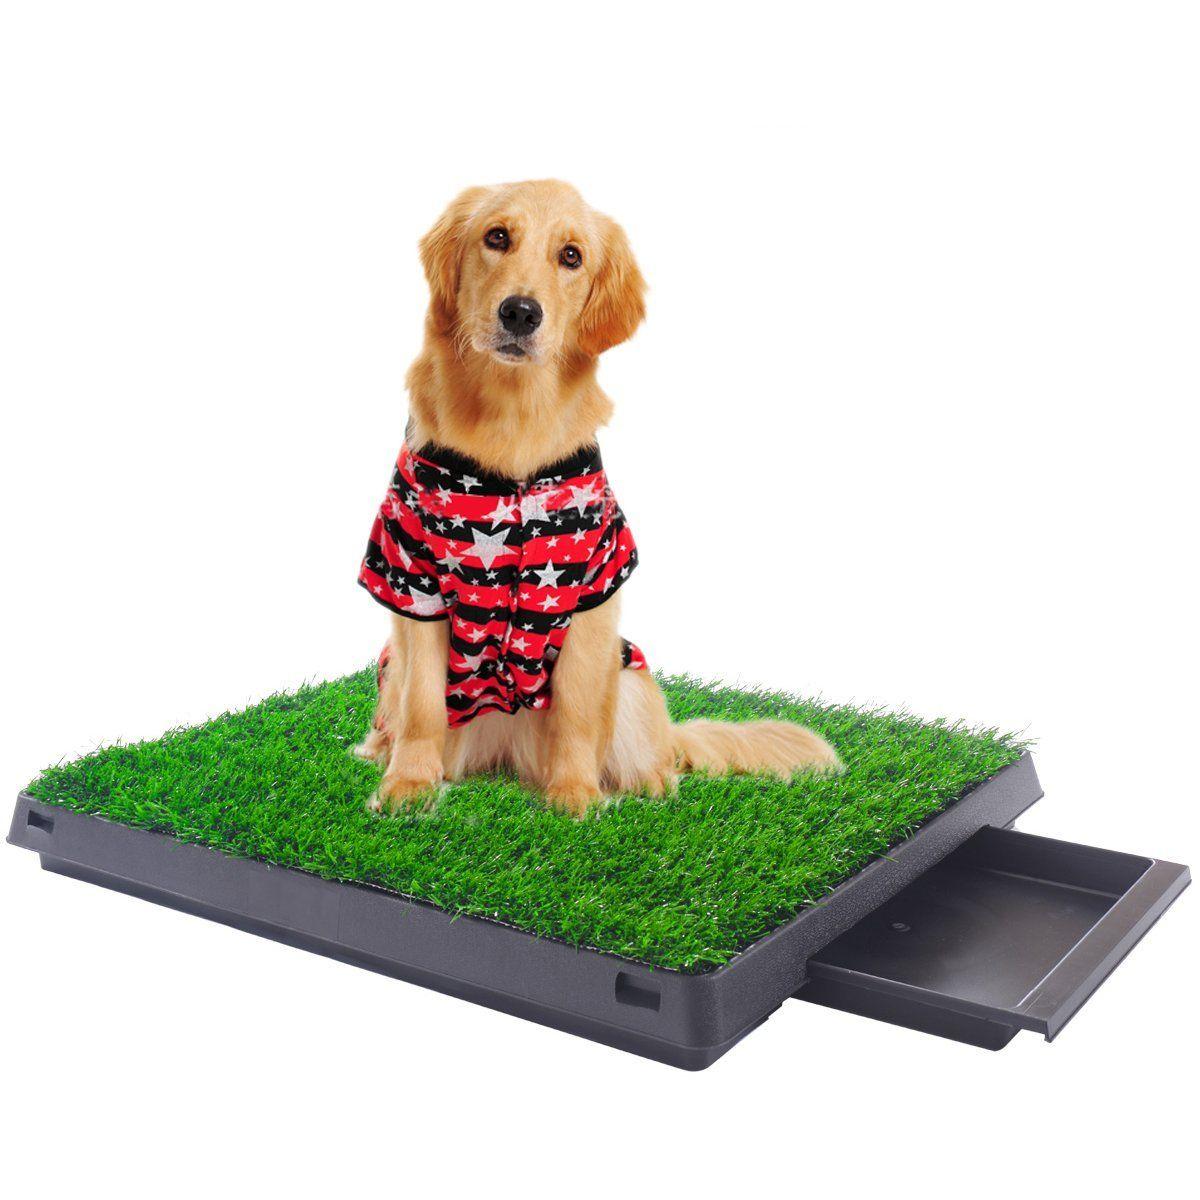 Iluvmyhome Anti Slip Pet Park Indoor Potty Dog Grass Mat Training